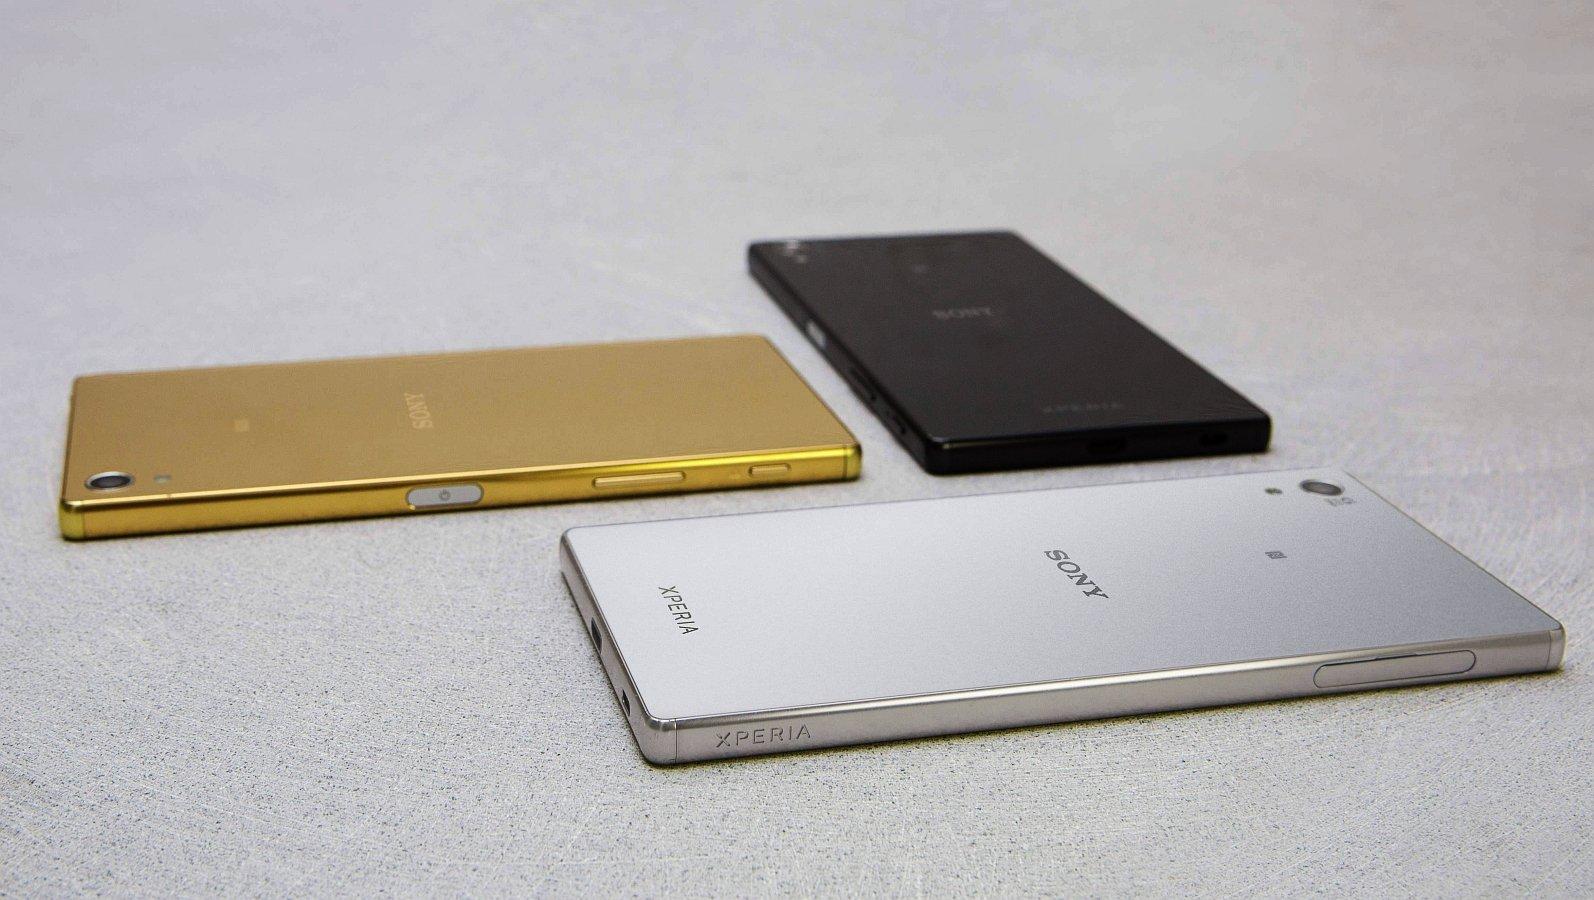 Sony xperia z5 premium price - aae1